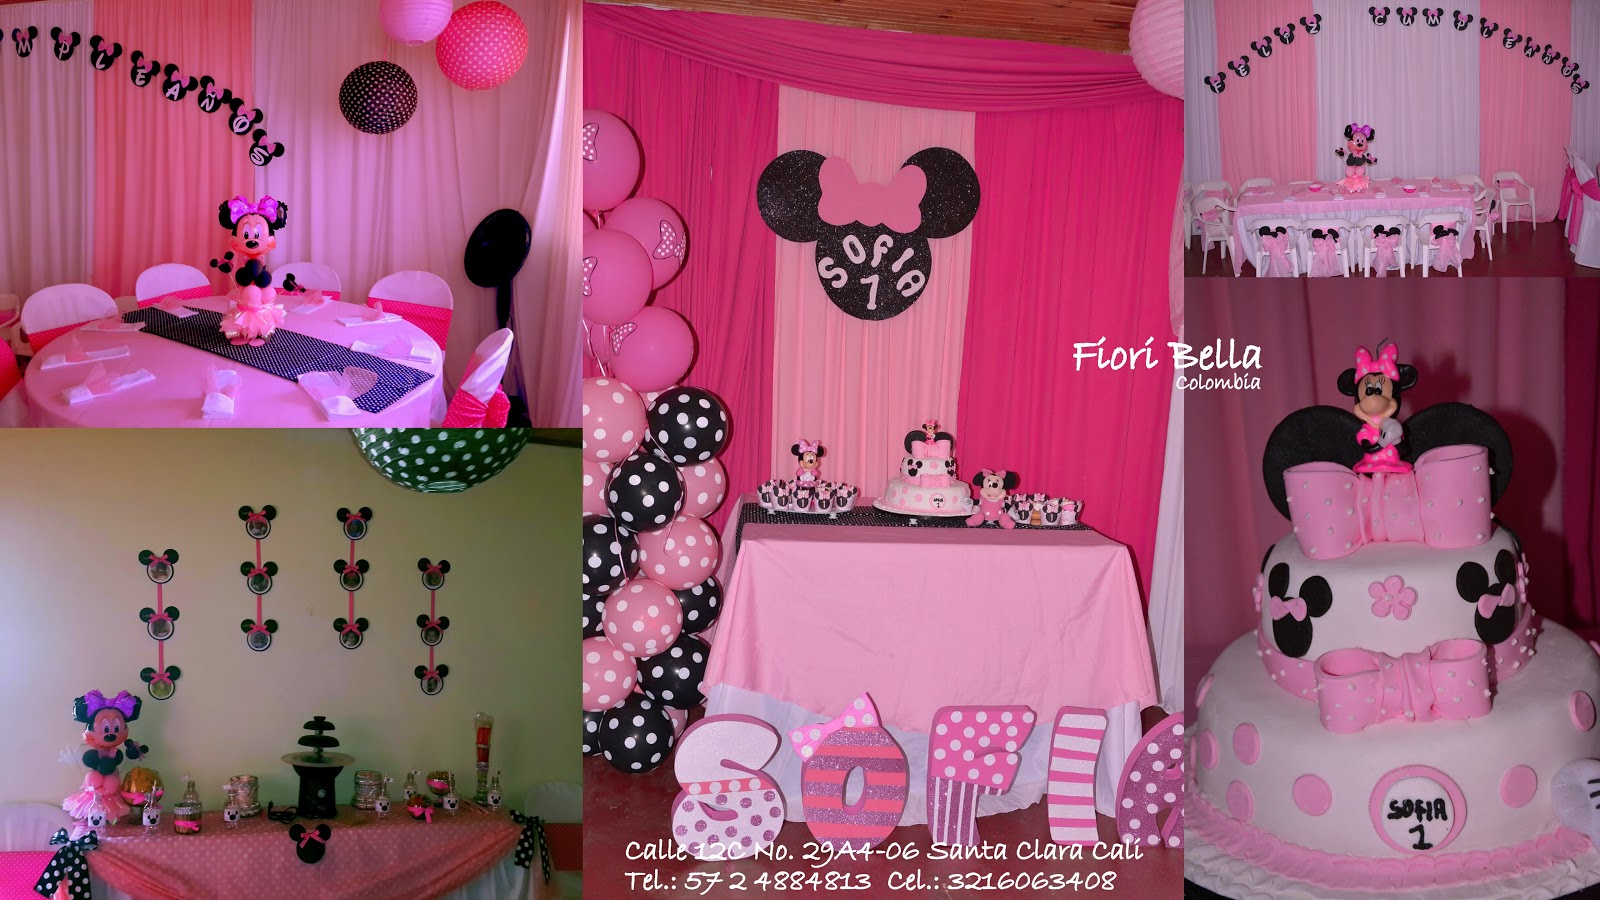 fiesta infantil nia temtica minie mouse with decoracion fiesta infantil nia